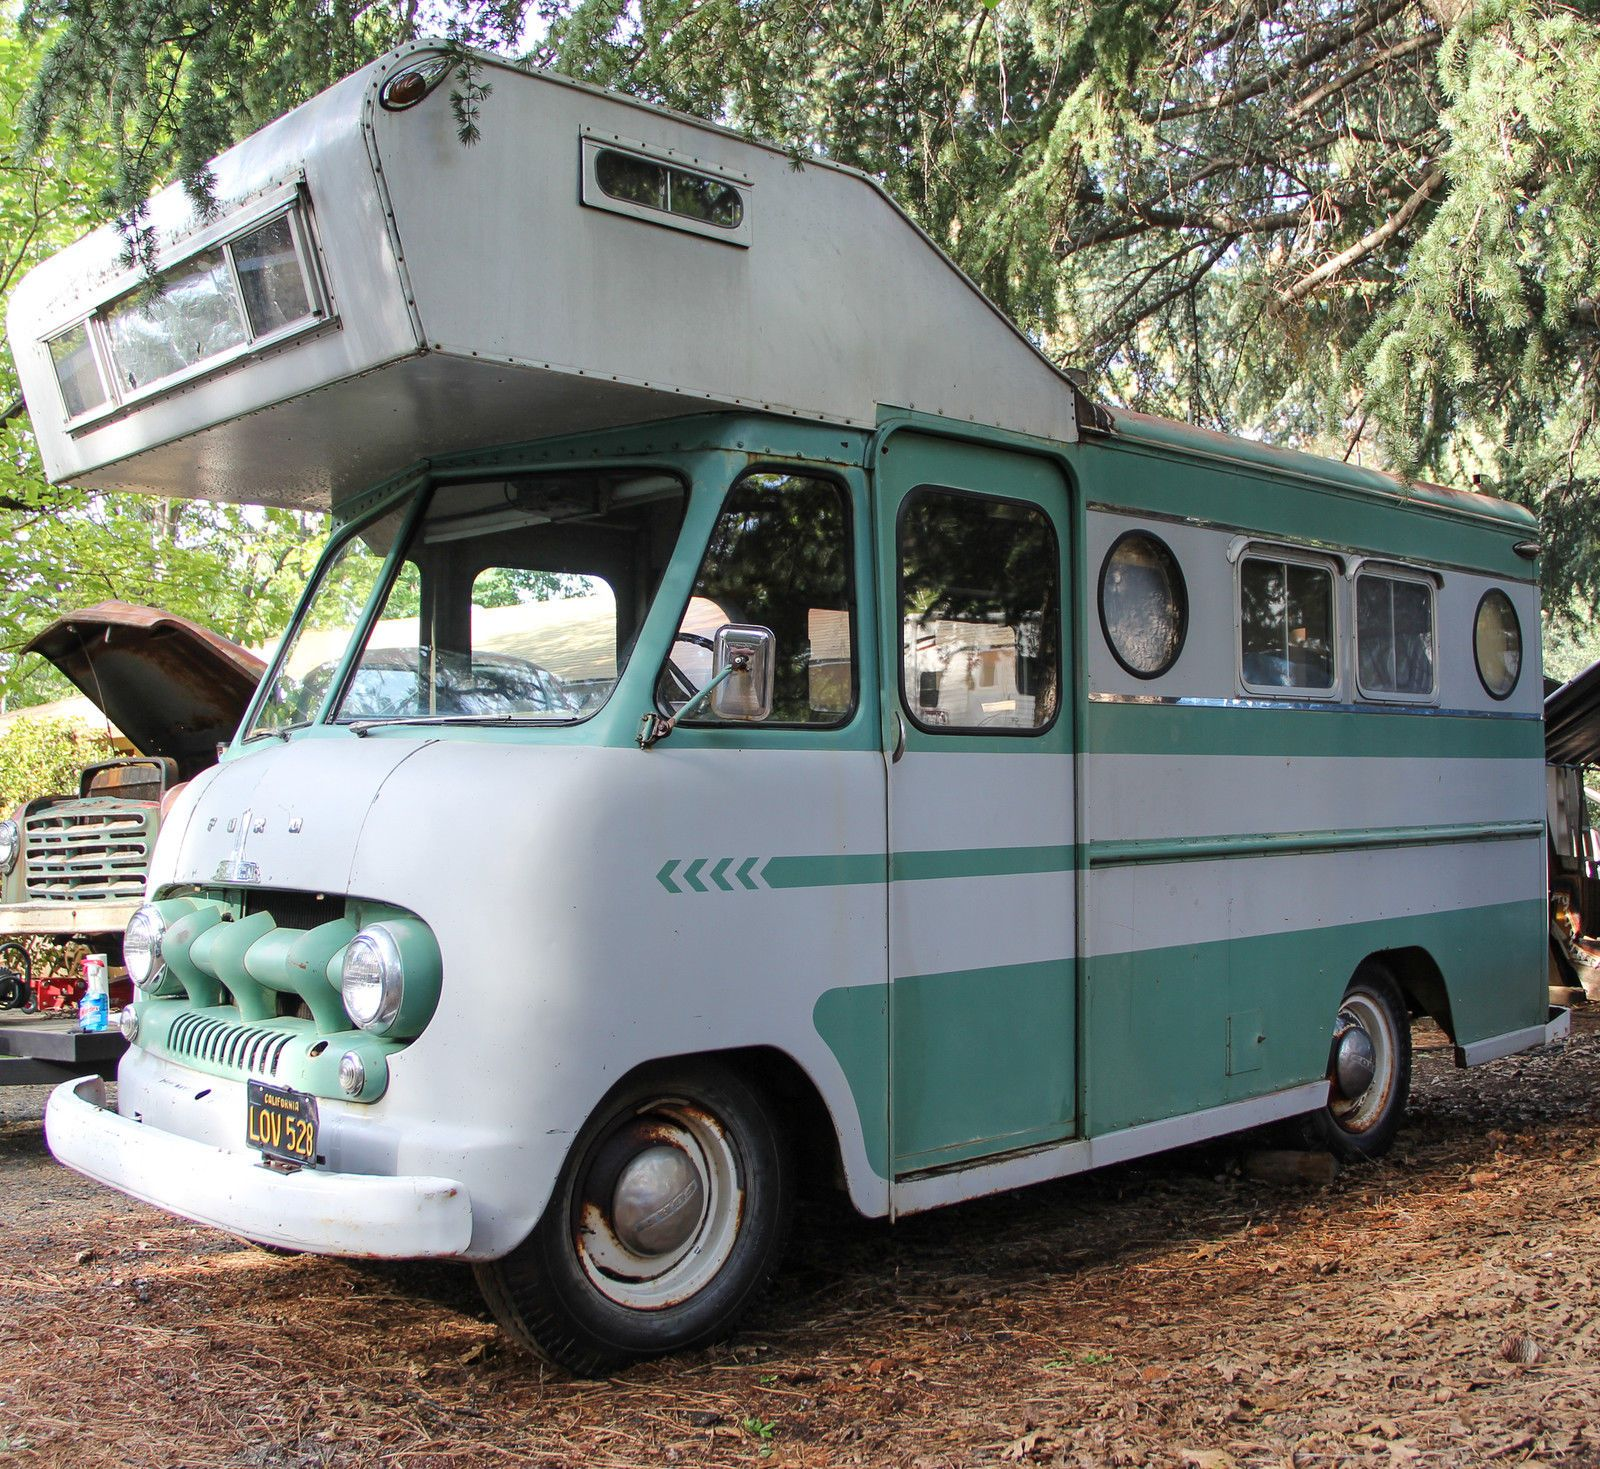 1951 Ford Boyertown body Paradise, CA Vintage camper